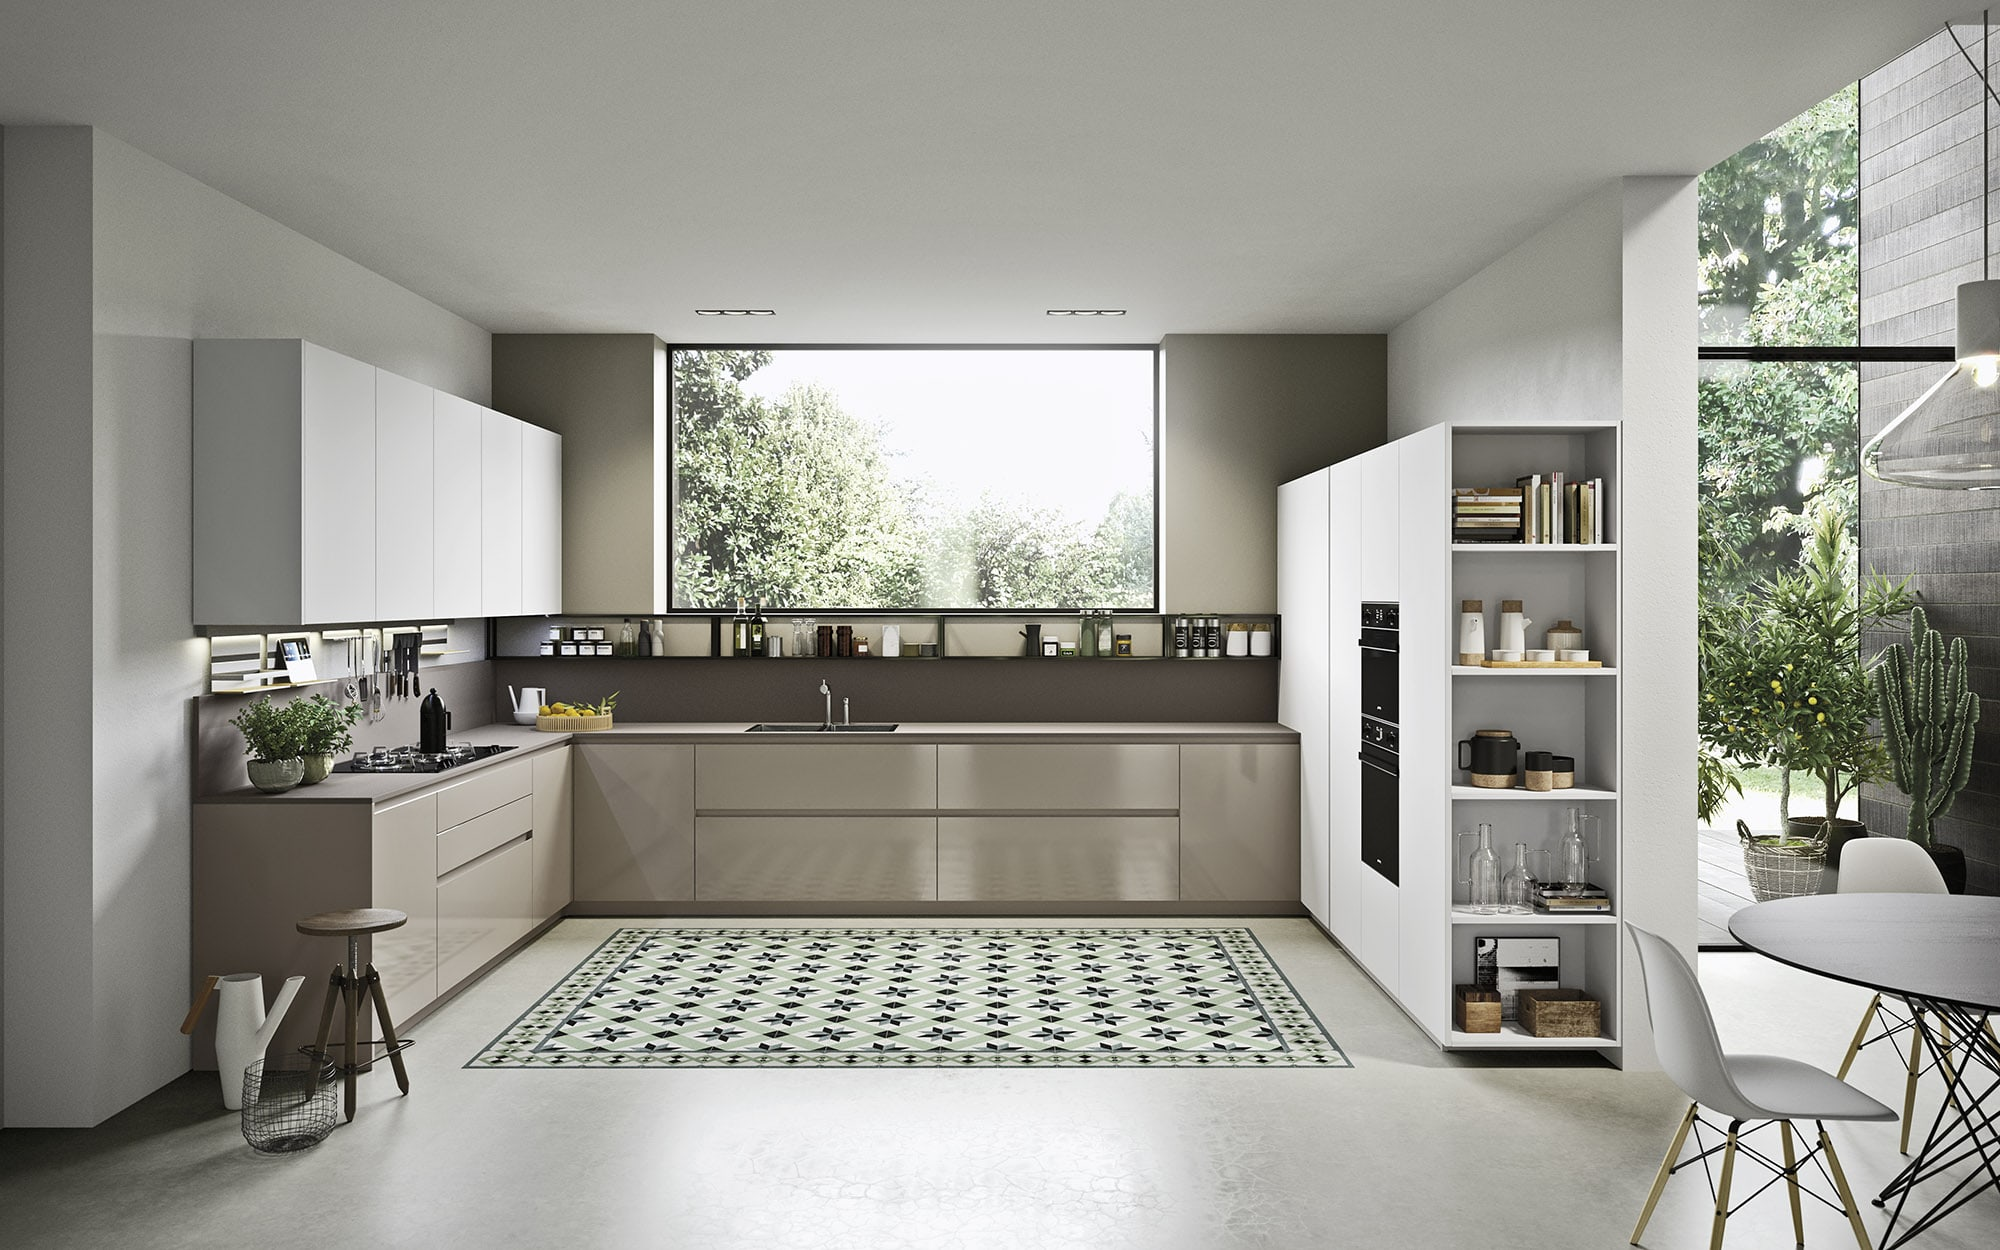 cucine-moderne-anglolare-ragusa-sicilia-min